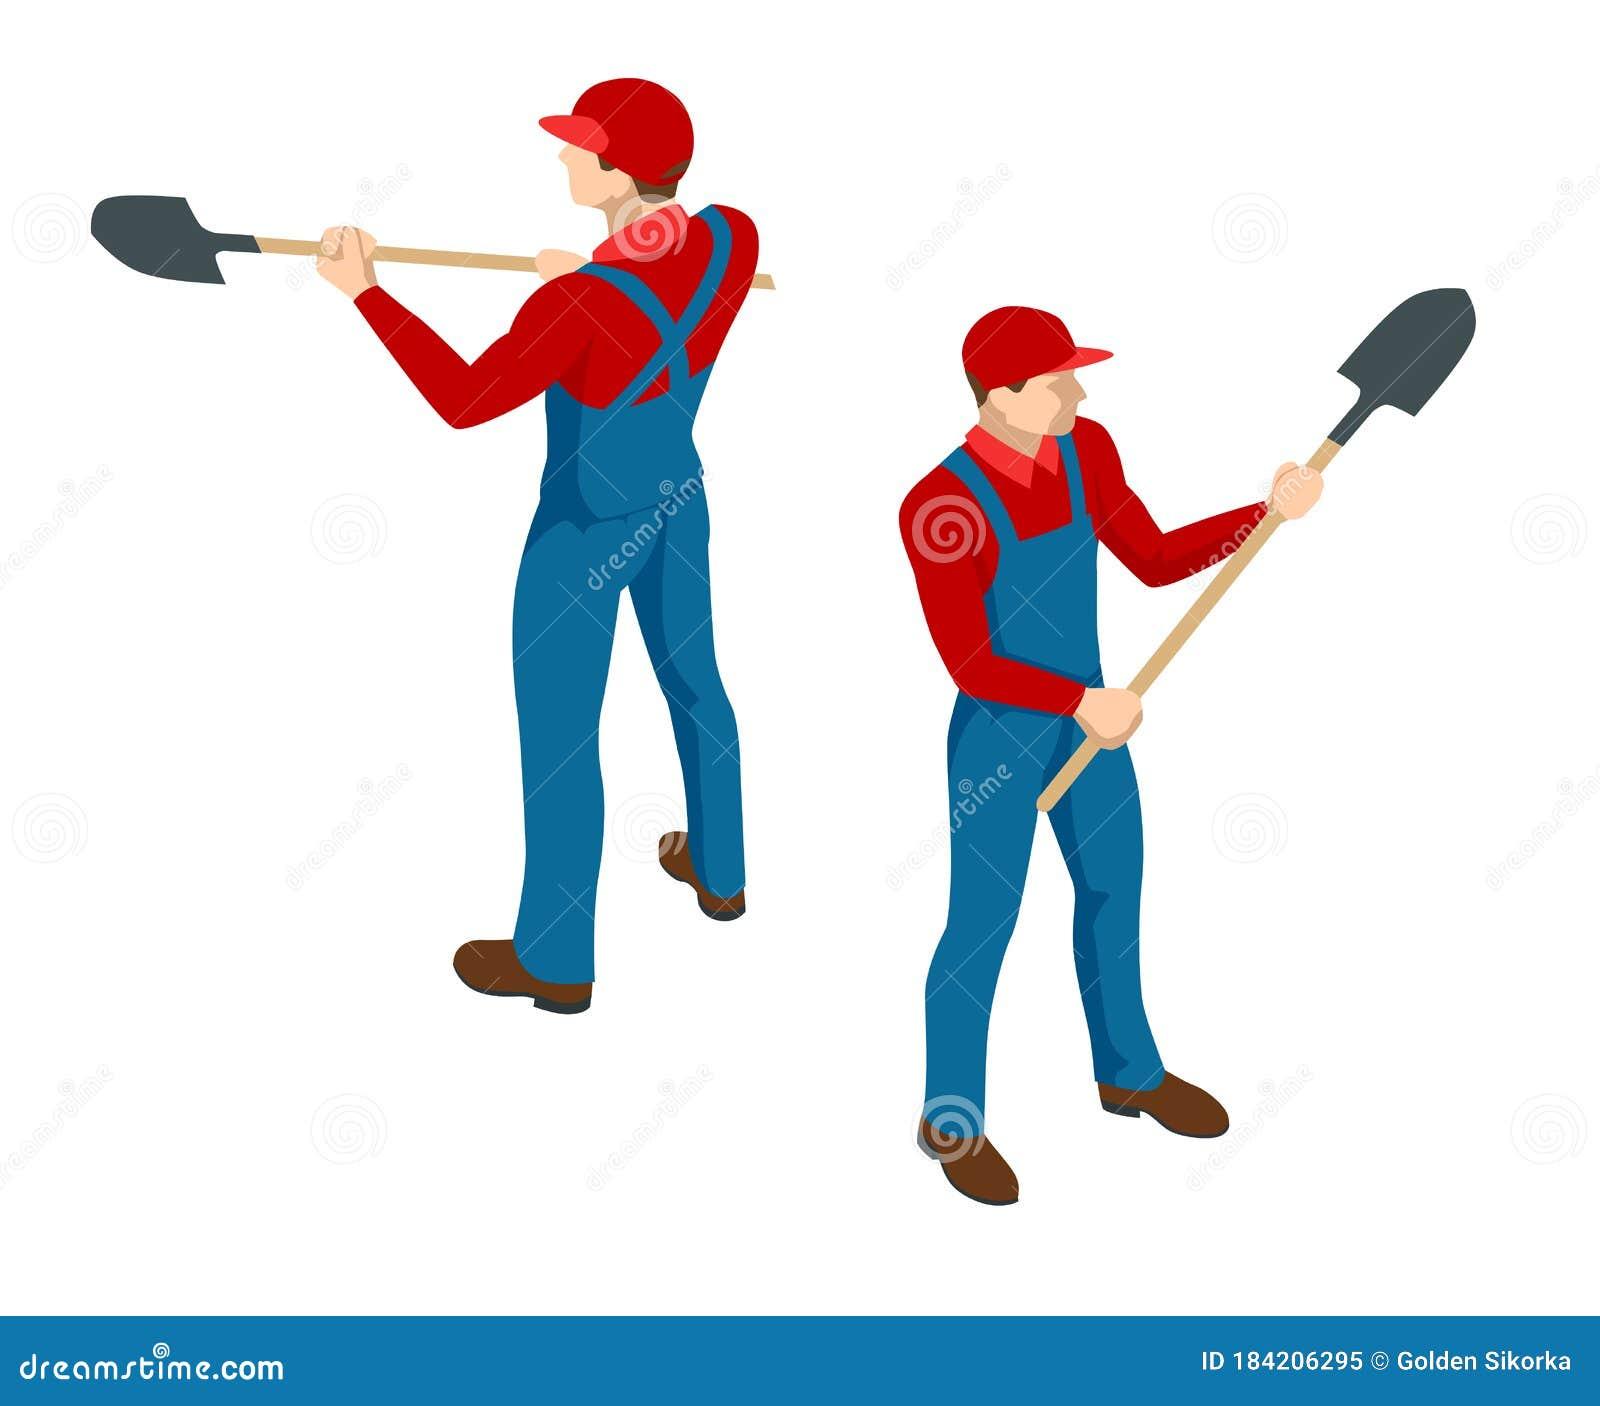 Digging Shovel Clip Art - Royalty Free - GoGraph